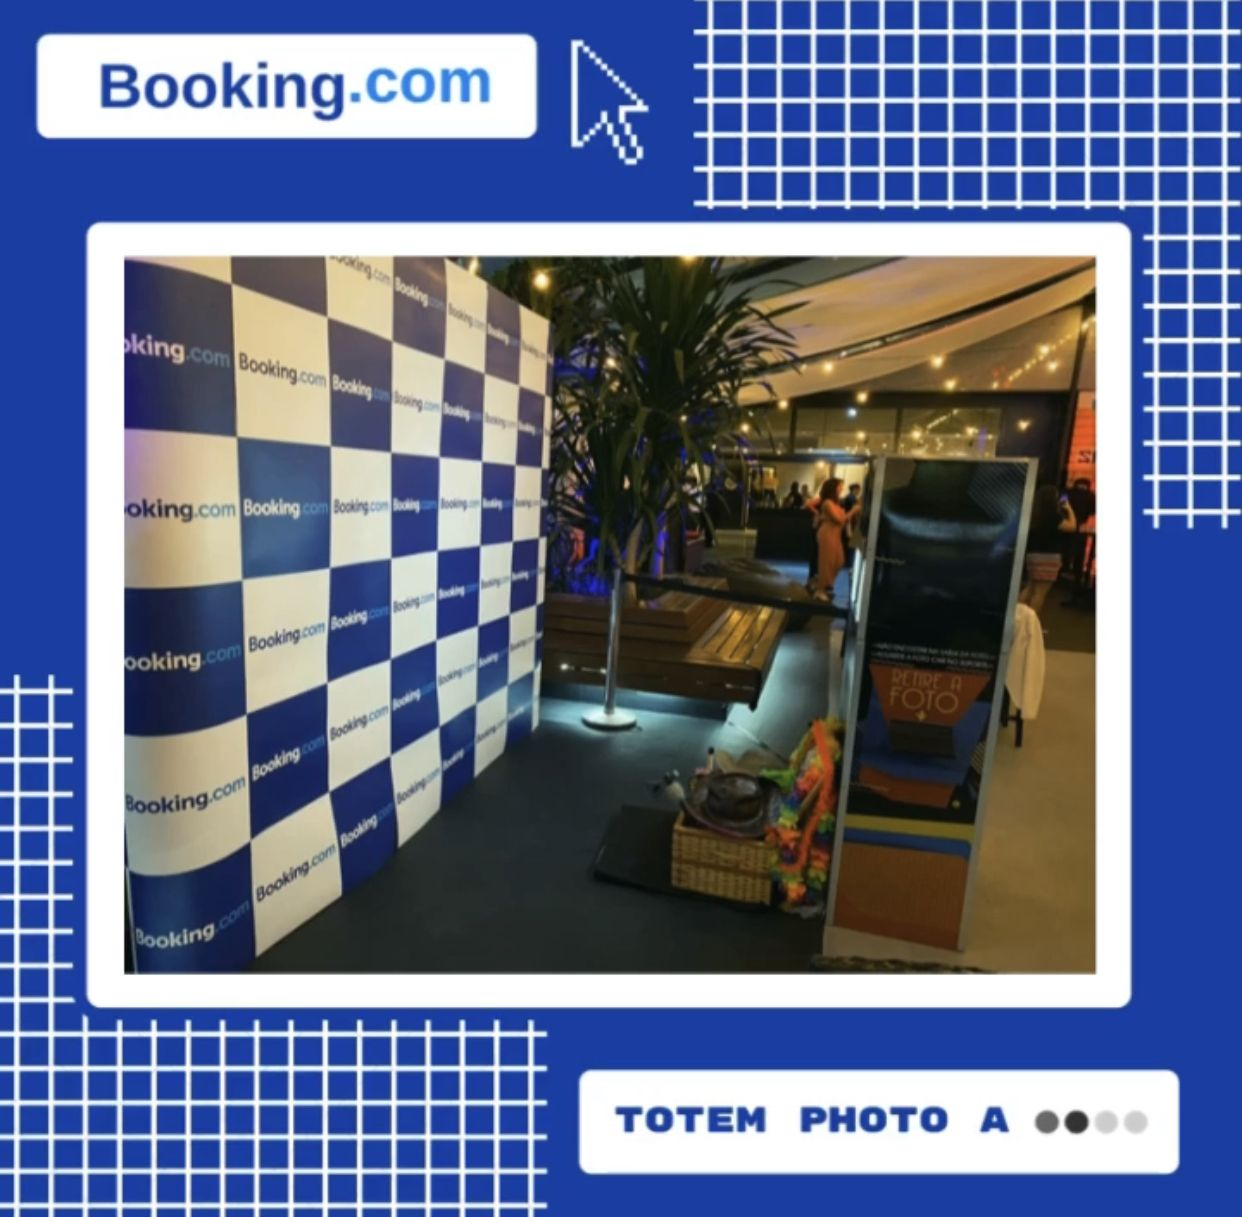 Cabine De Foto E Totem De Foto P Aluguel Cabine Fotografica P Festas Cabine De Fotos Cabine Fotografica Fotos